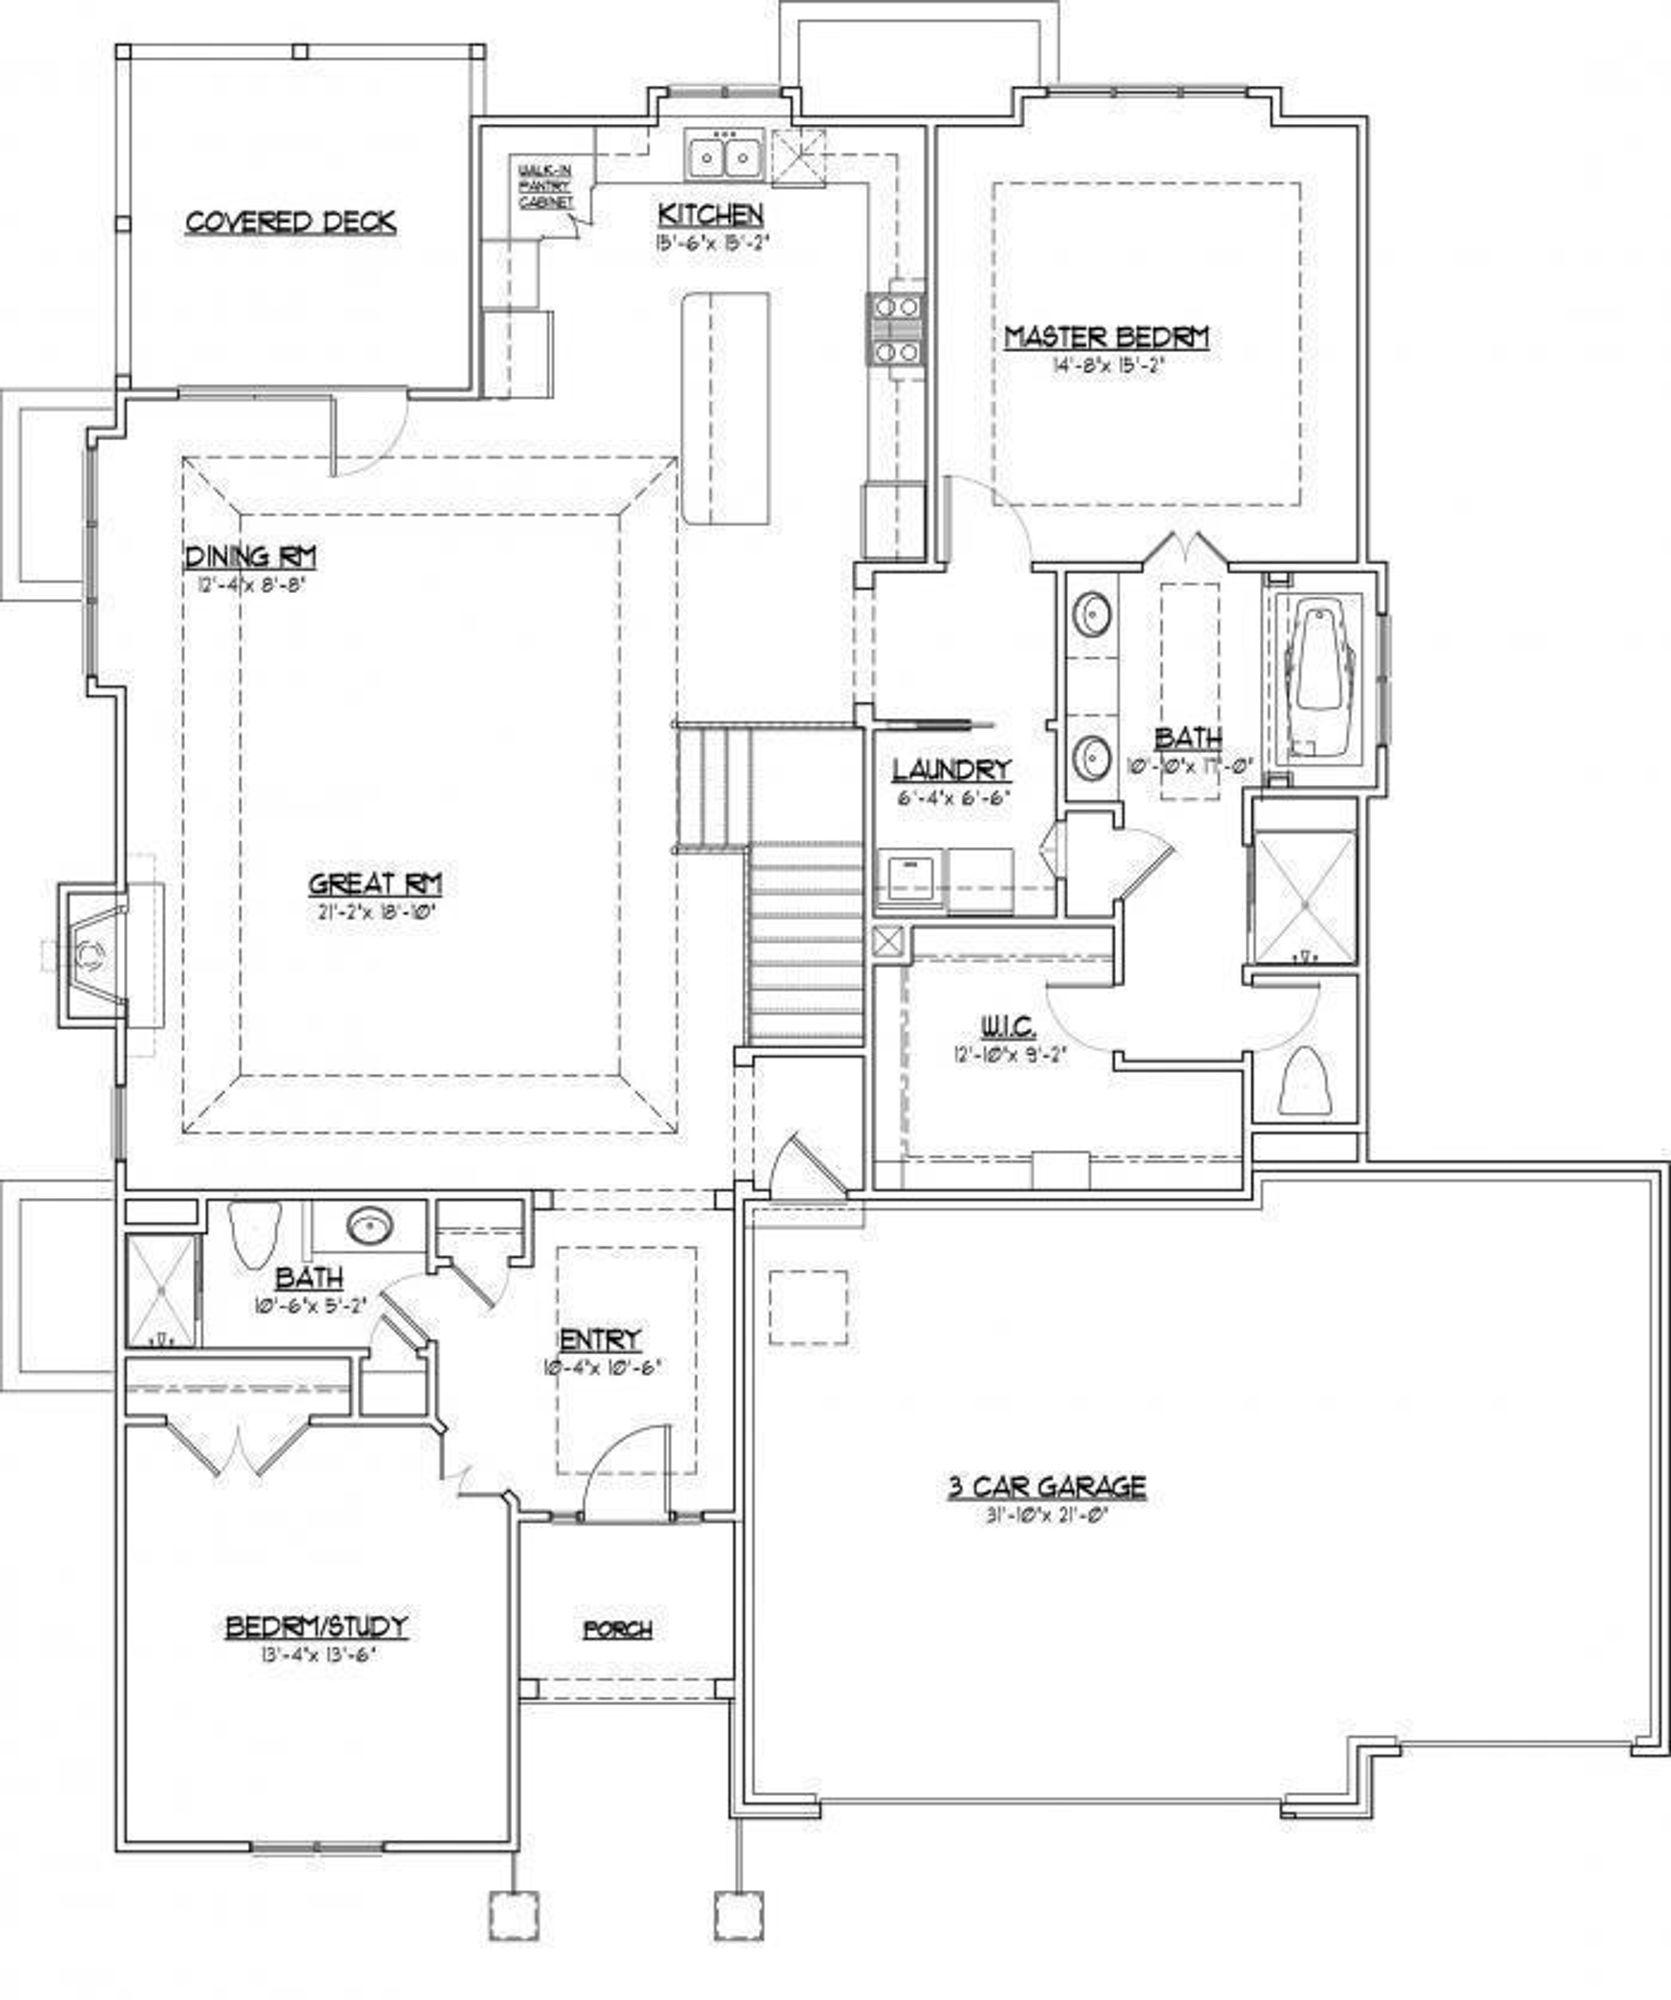 VHR Brookwood Main Level footprint